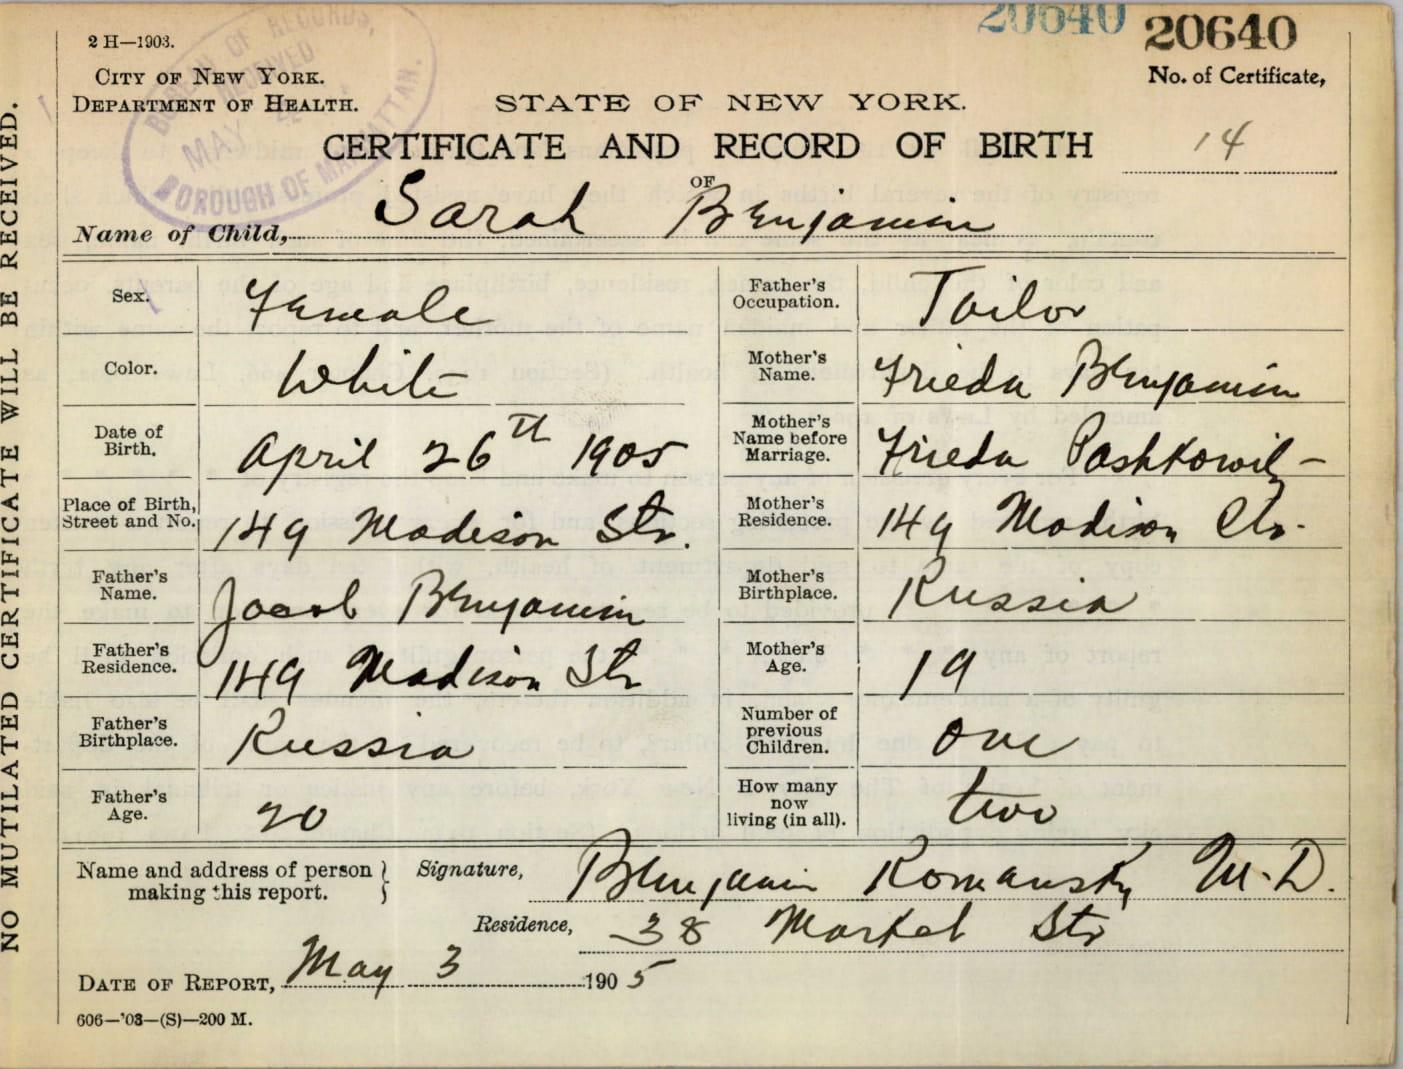 Lawrence Kane Sarah Benjamin Birth Certificate